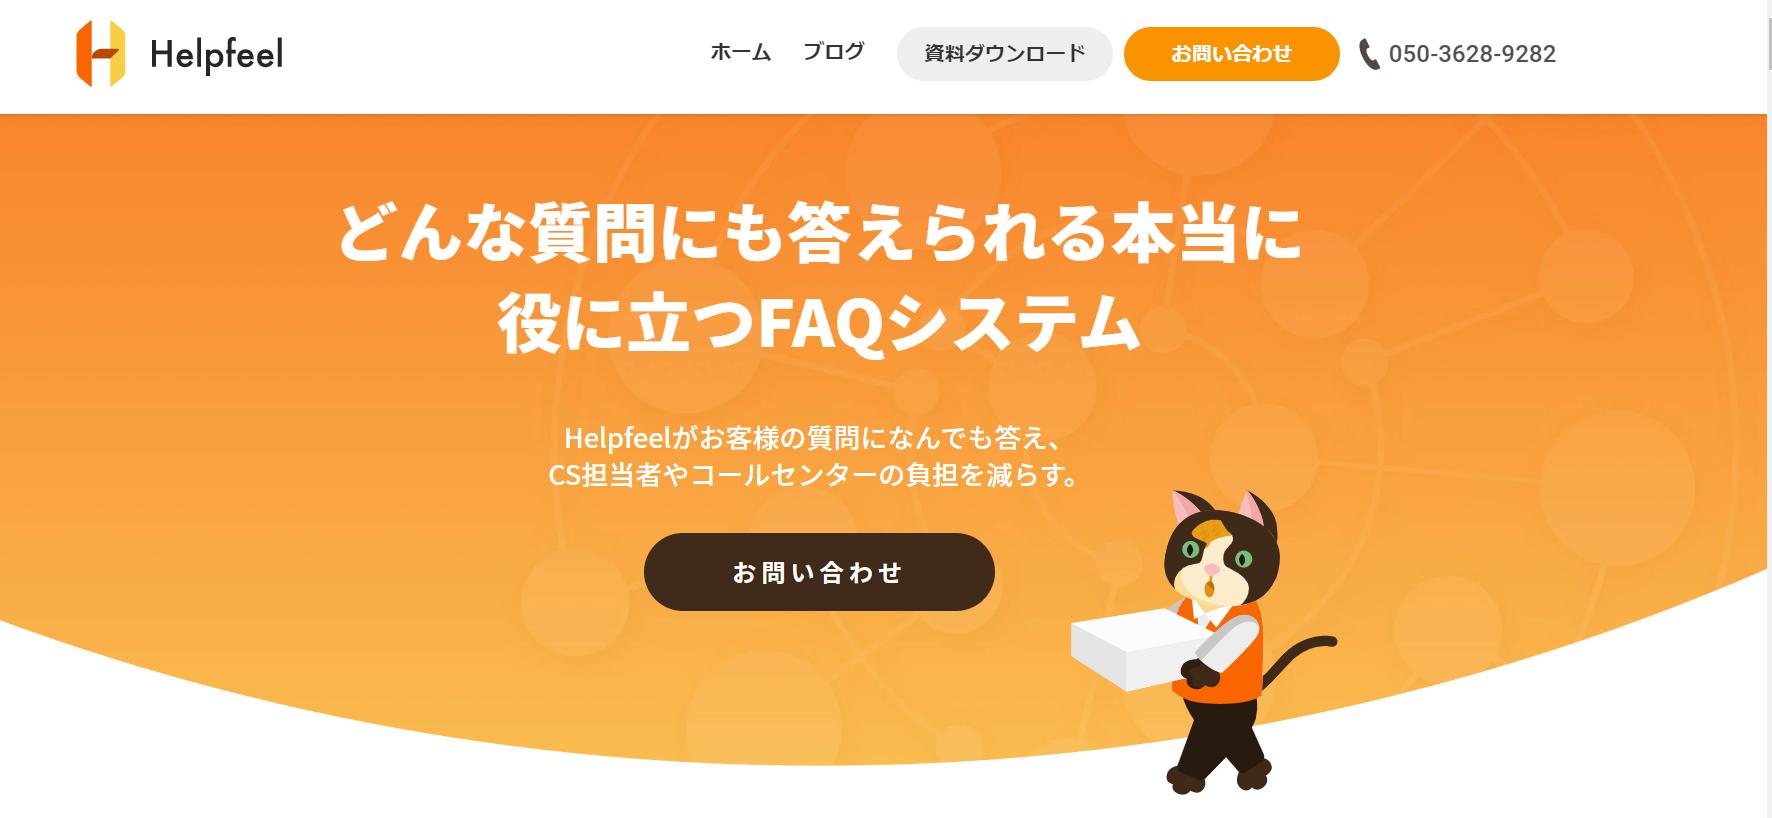 FAQツール10「Helpfeel」